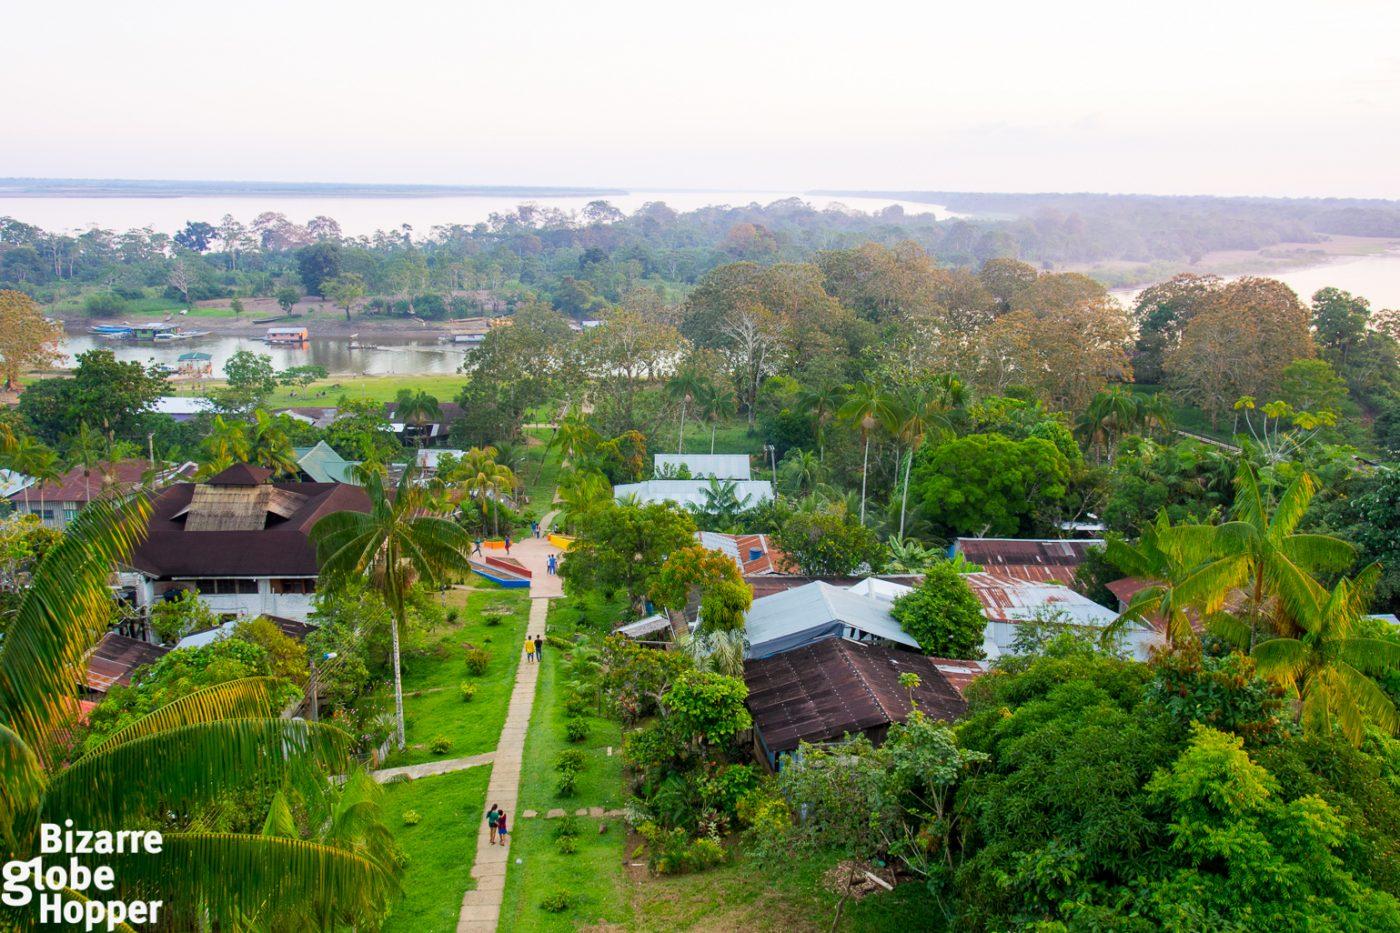 Puerto Narino, Colombia Contributed by Niina from Bizarre Globe Hopper